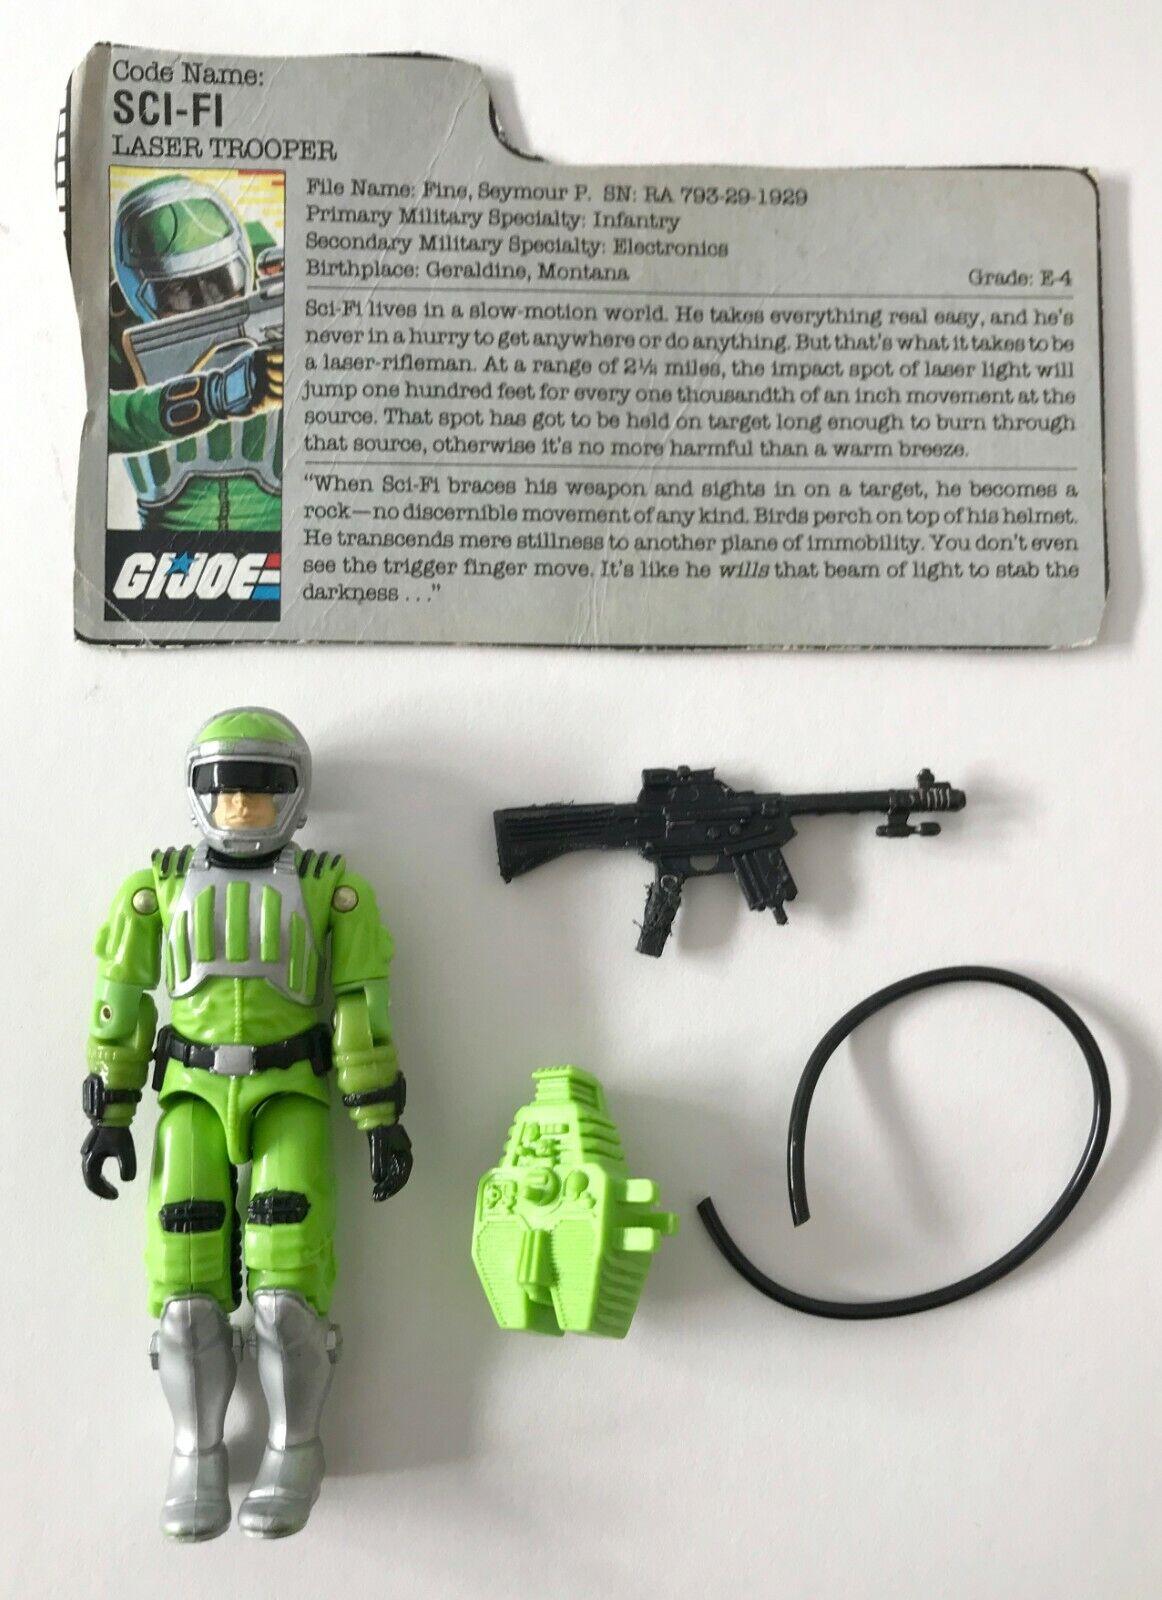 Vintage Gi G.I. JOE Sci-Fi Figure Loose With File Card - $14.99